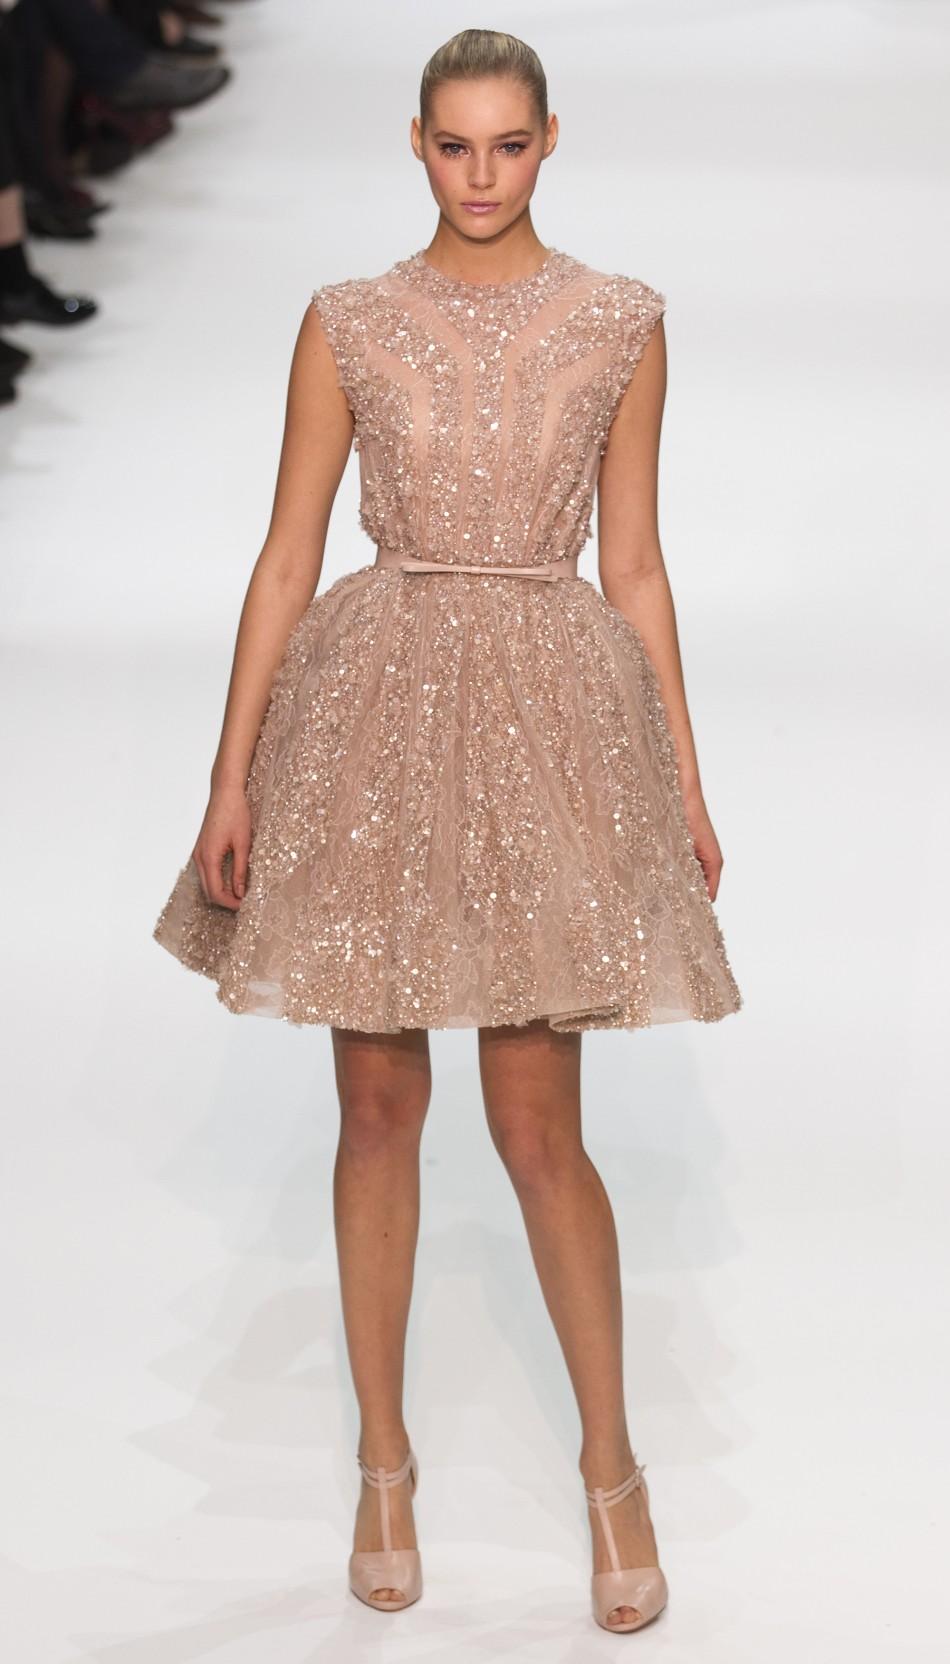 Elie Saab Couture Dress